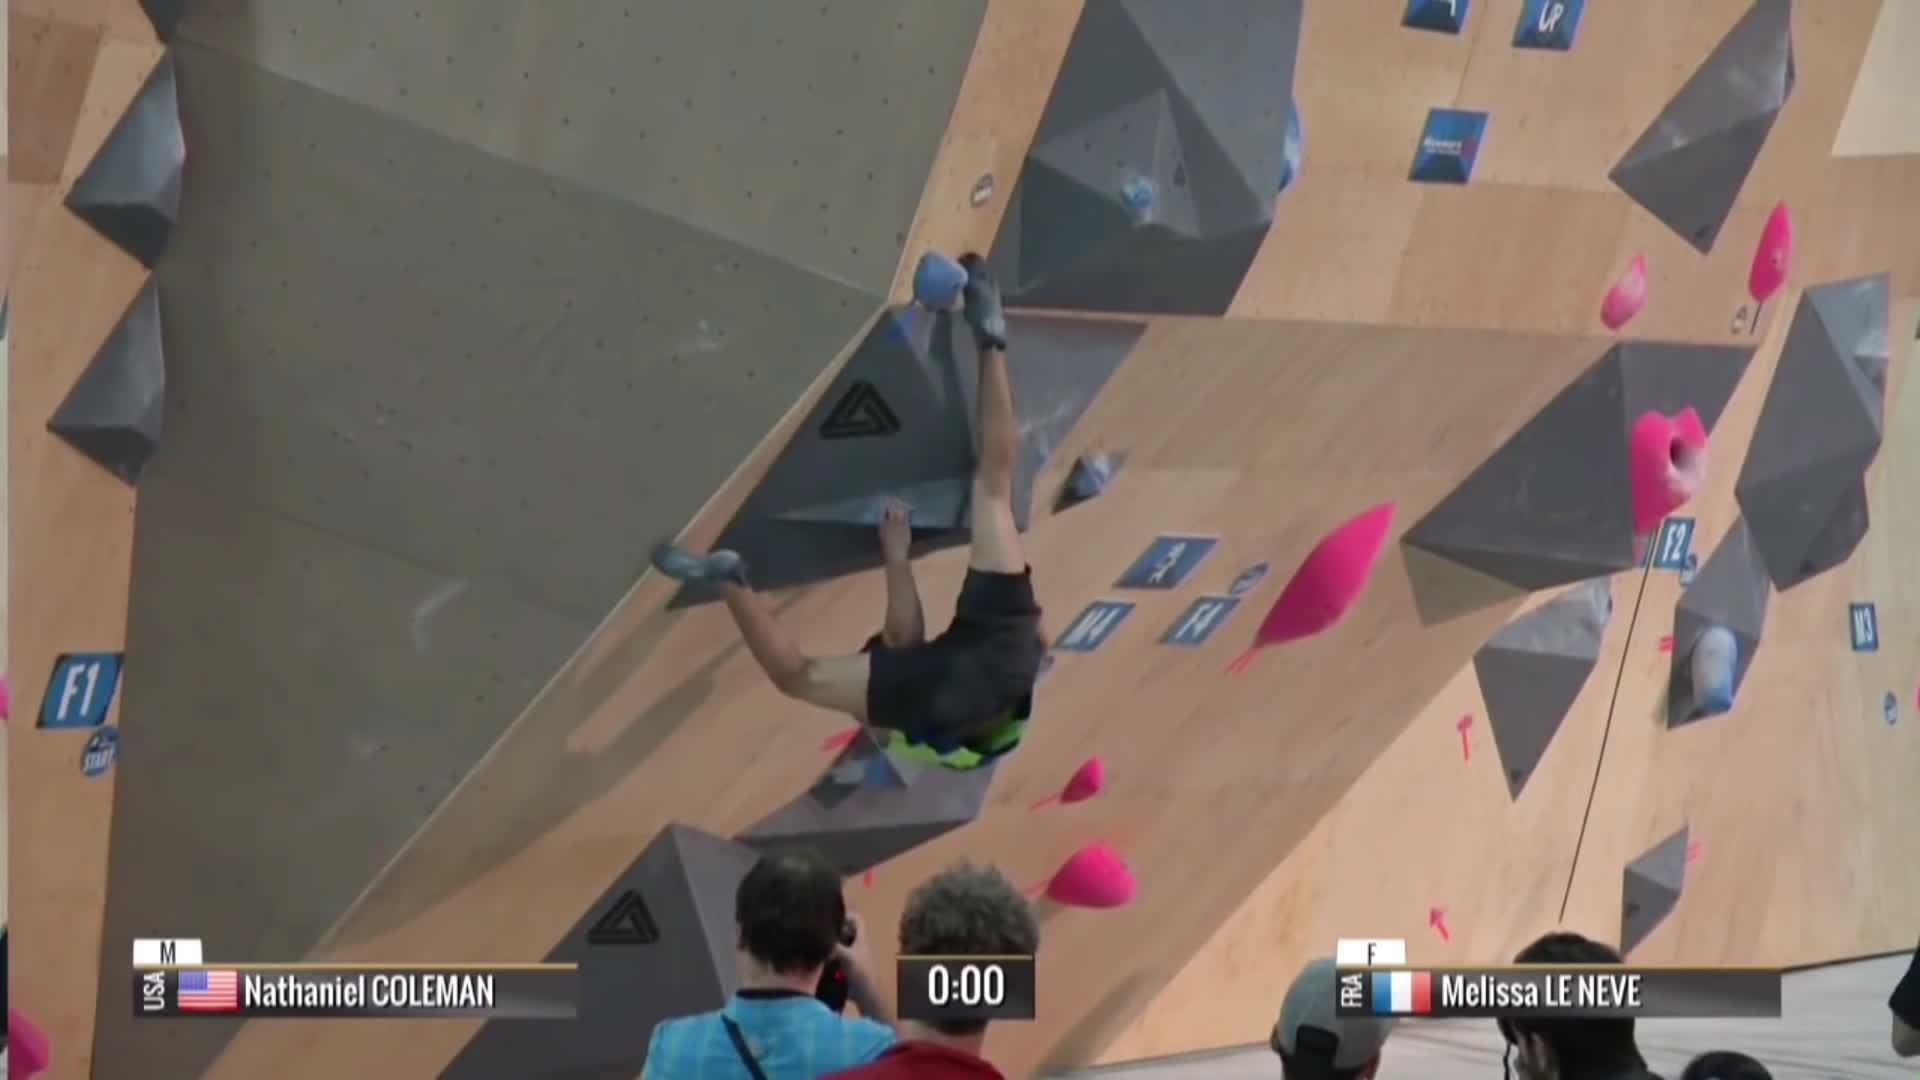 hard boulder moves 2015, international federation of sport climbing (organization), psyched bouldering, Nathaniel Coleman Bouldering World Cup 2015 GIFs